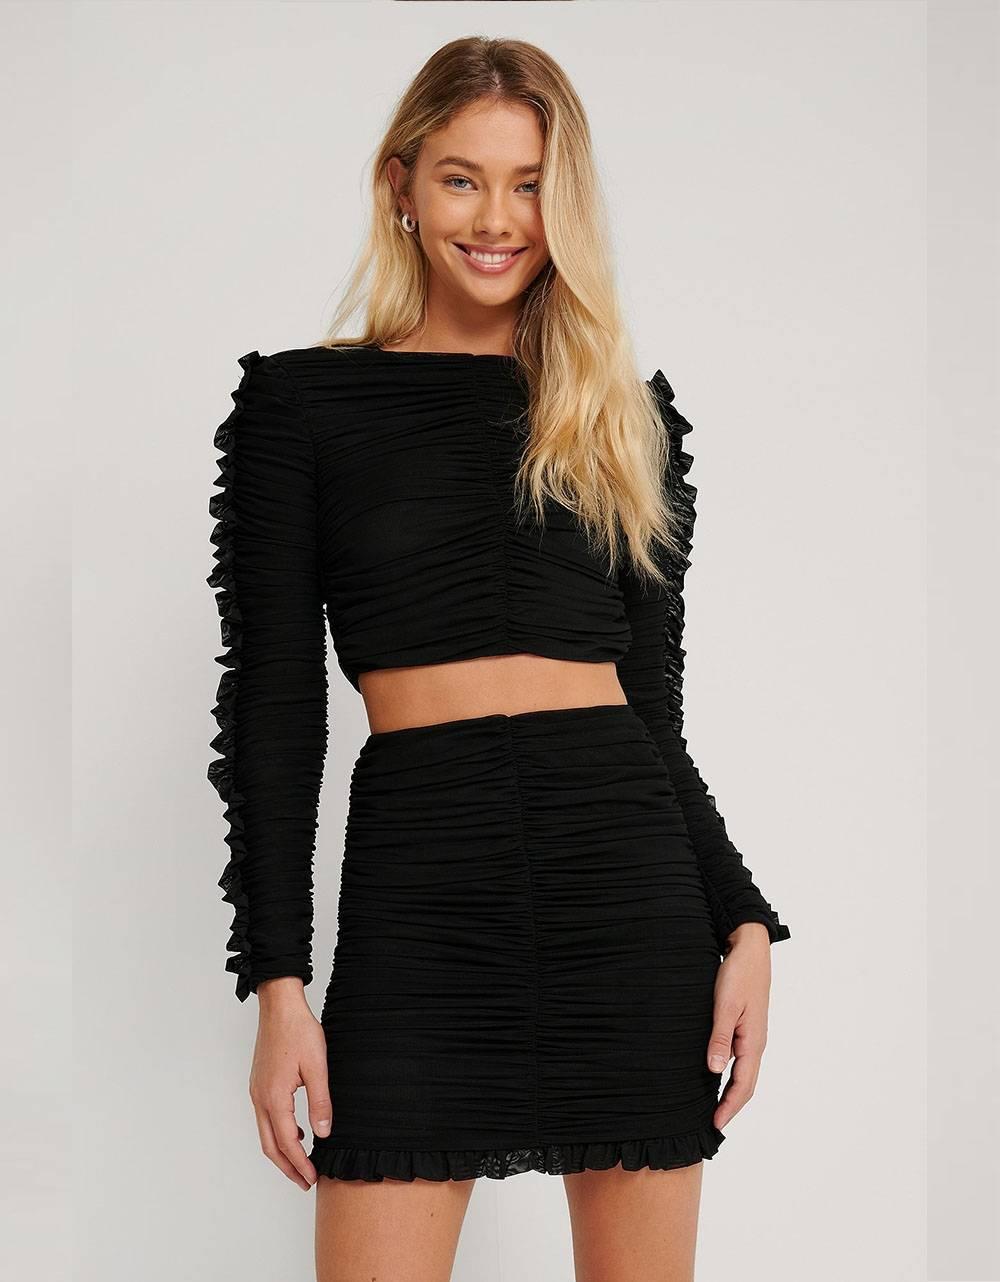 NA-KD frill detail gathered skirt - black NA-KD Skirt 52,00€